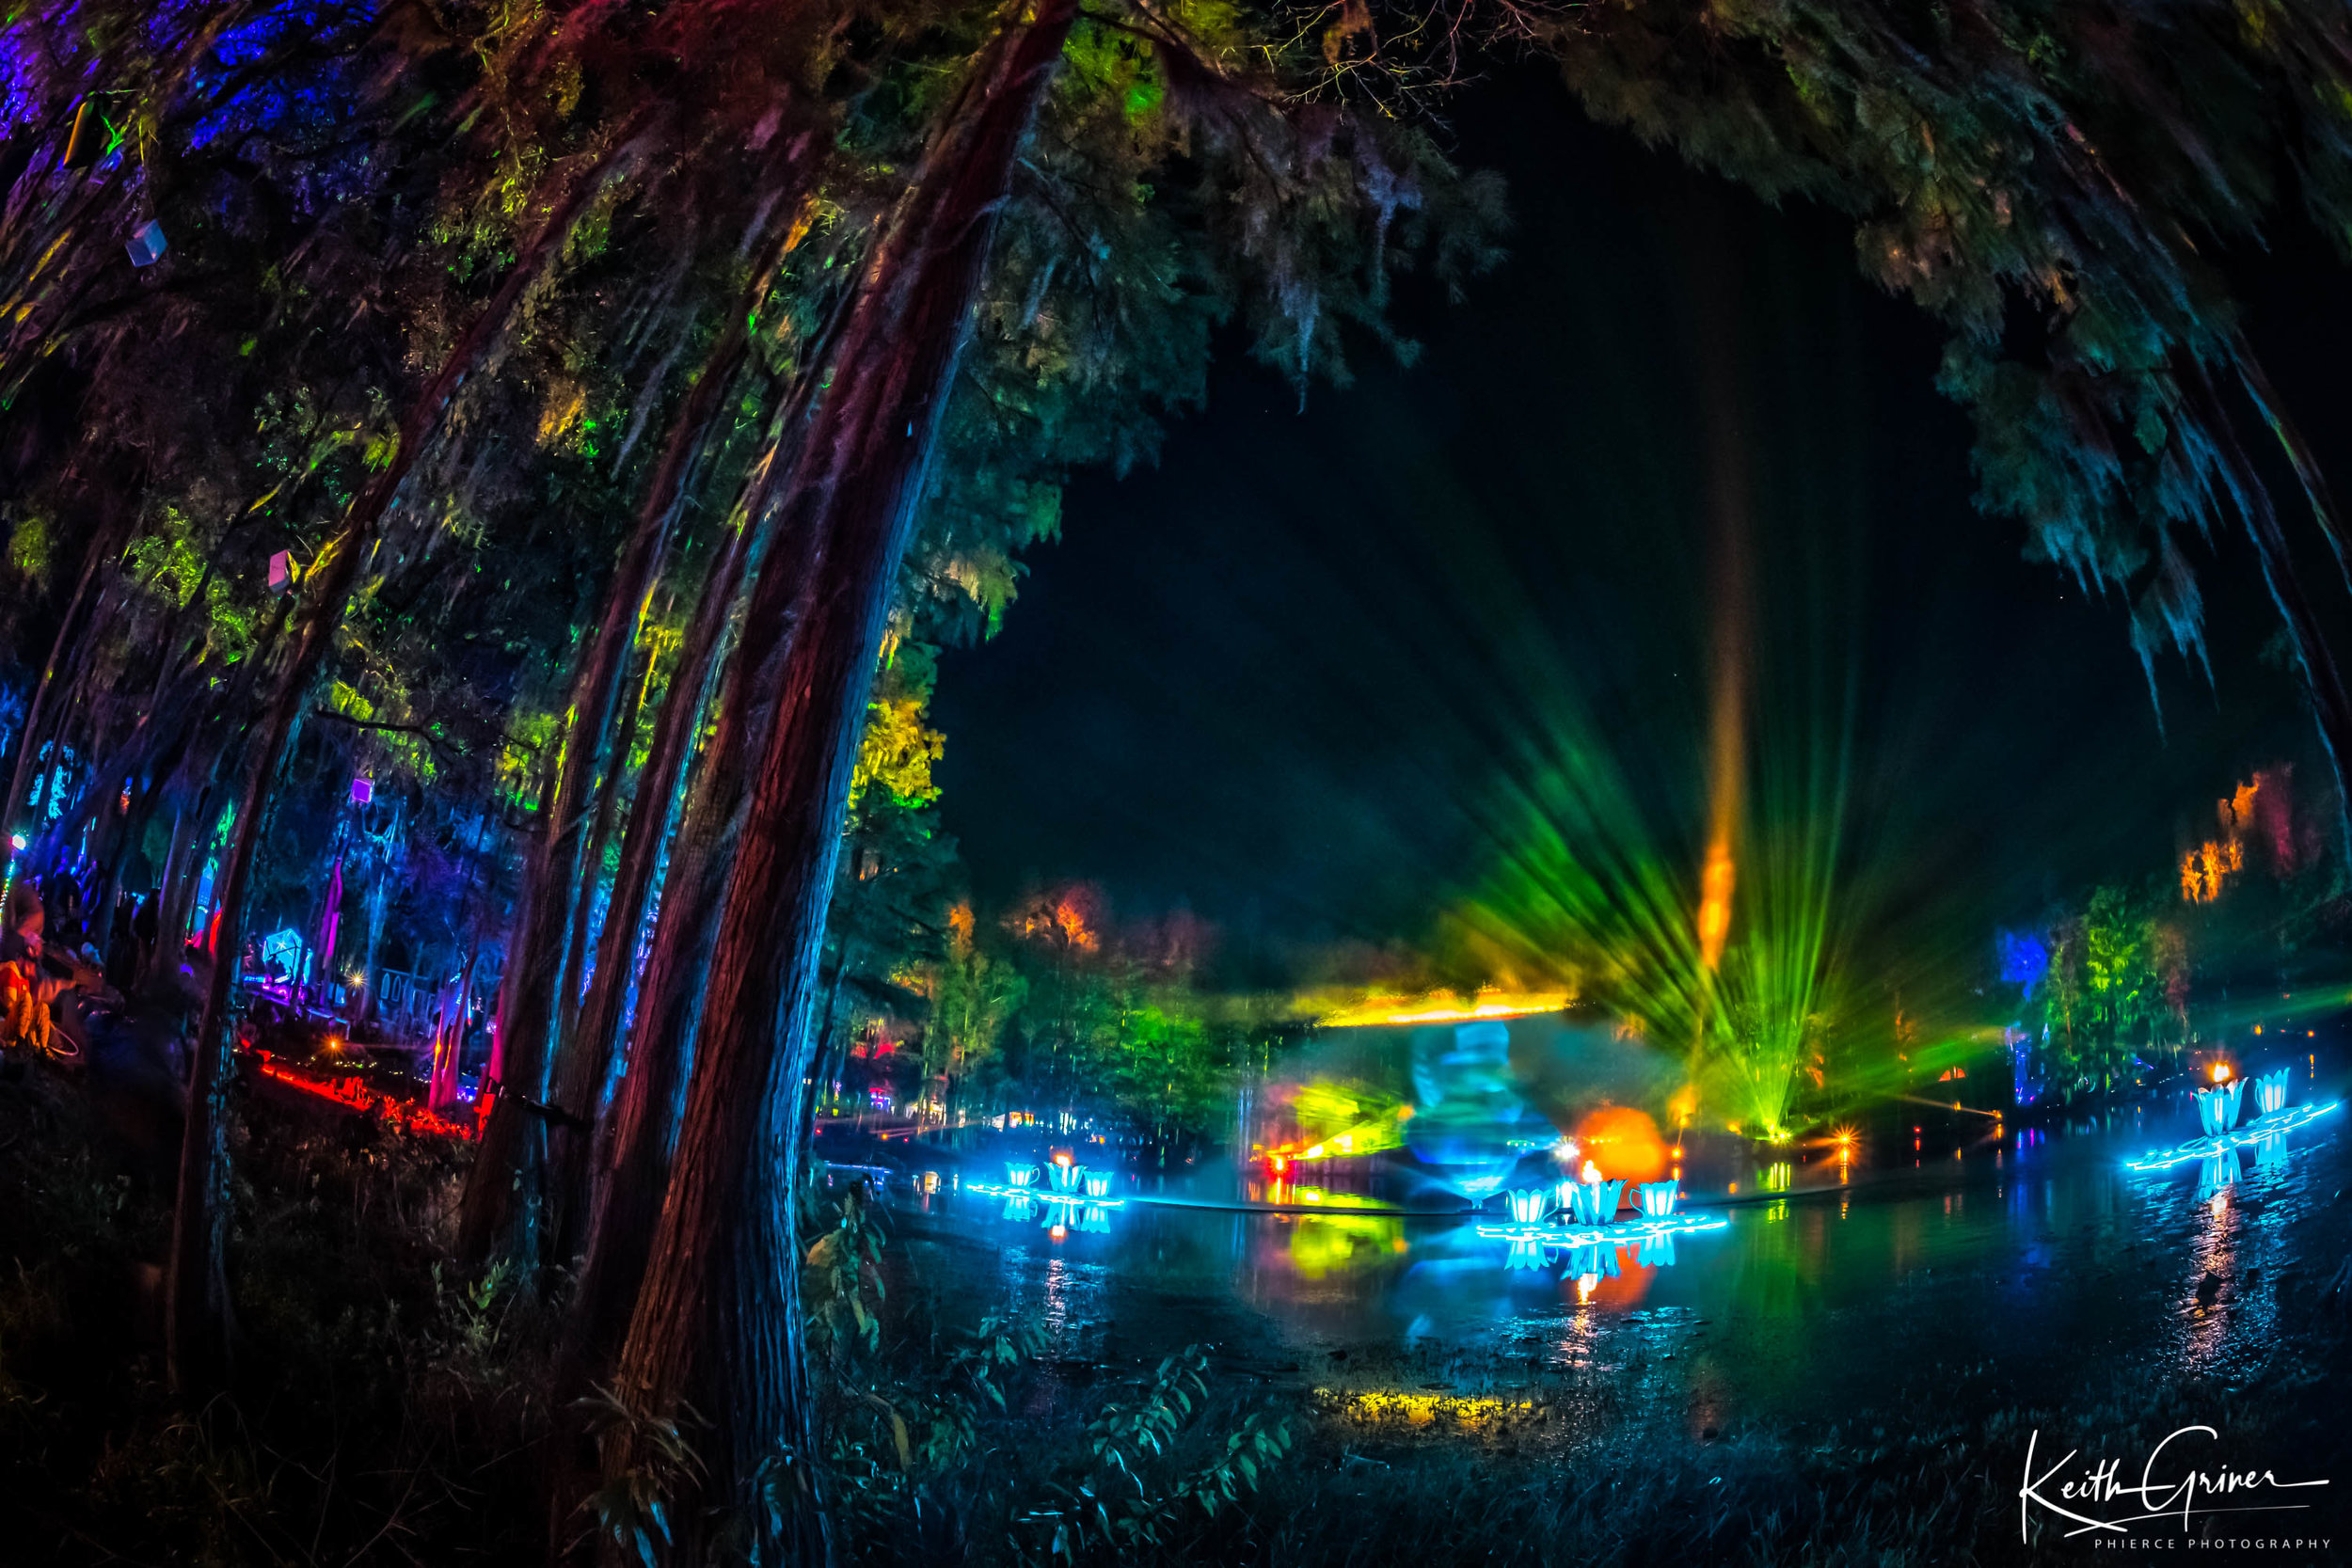 Hula_Spirit Lake_by Keith Griner 0D5_3213-Edit.jpg